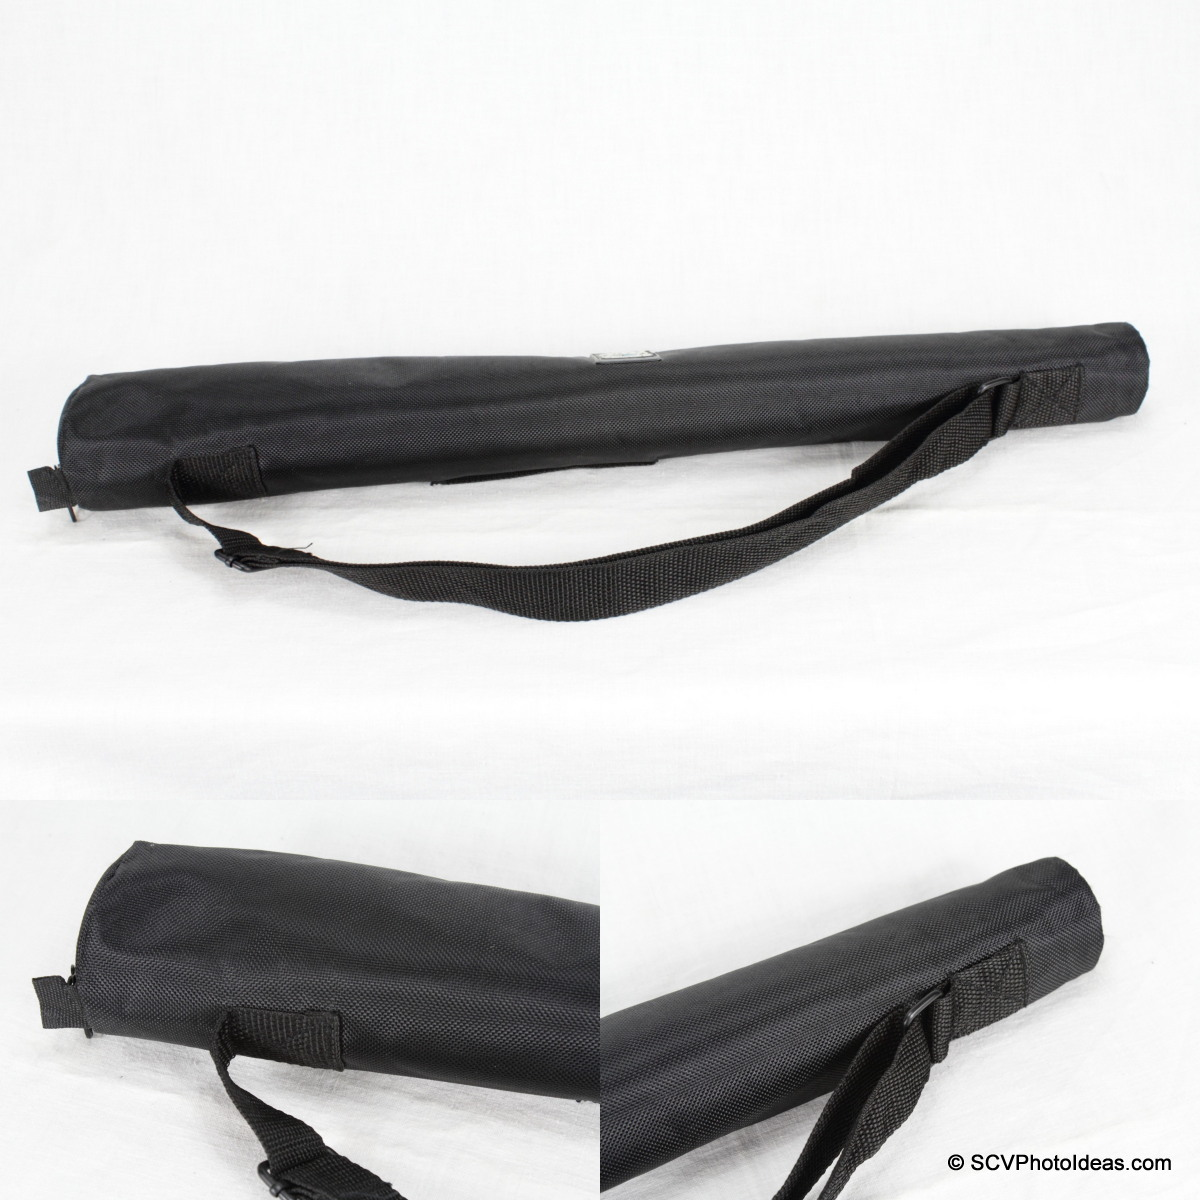 Triopo GL-70 CF Monopod - carrying shoulder strap